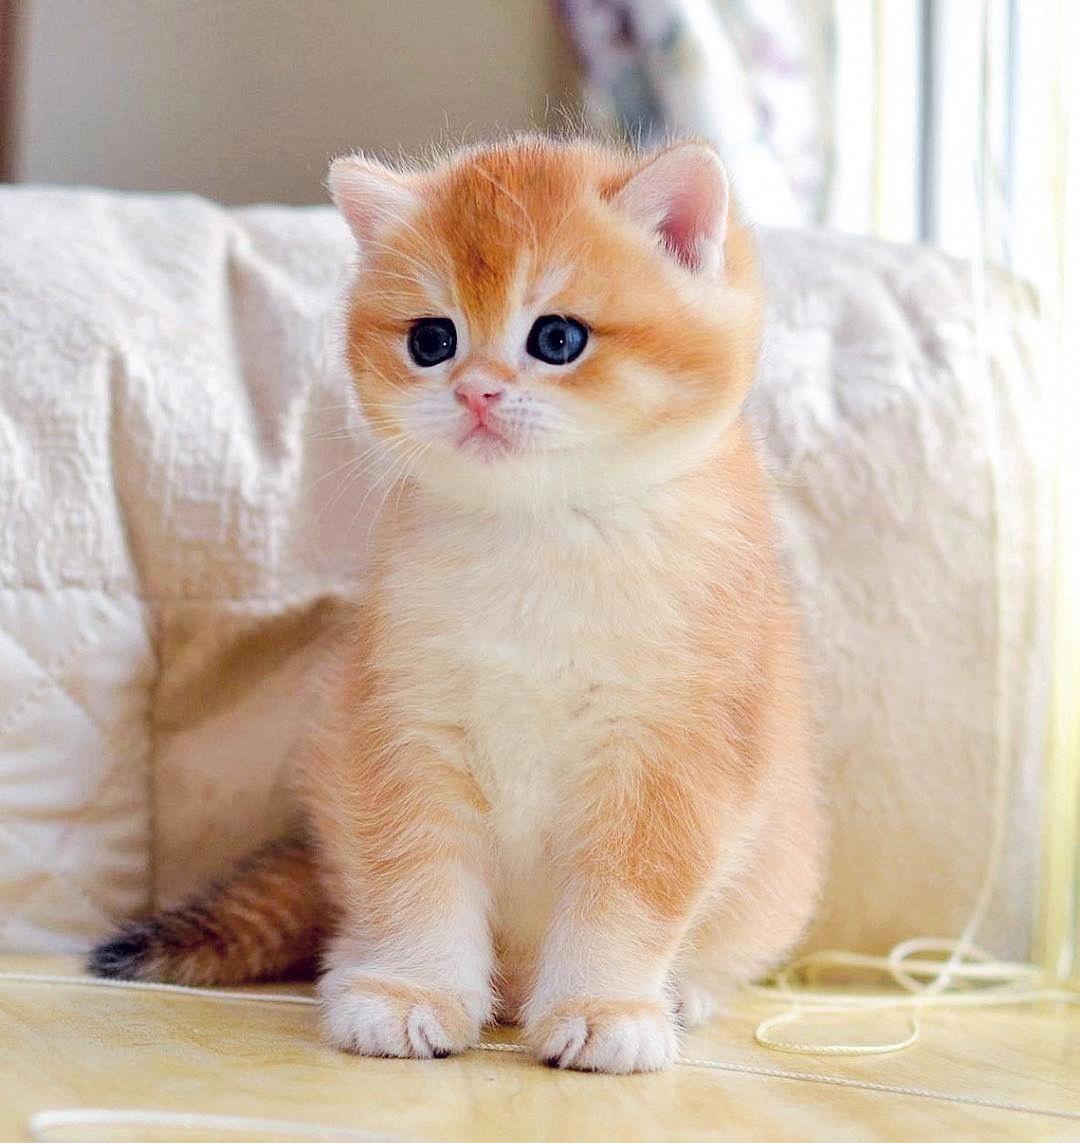 Cute Animals Jumpsuit Kittens Cutest Cats Cute Animals